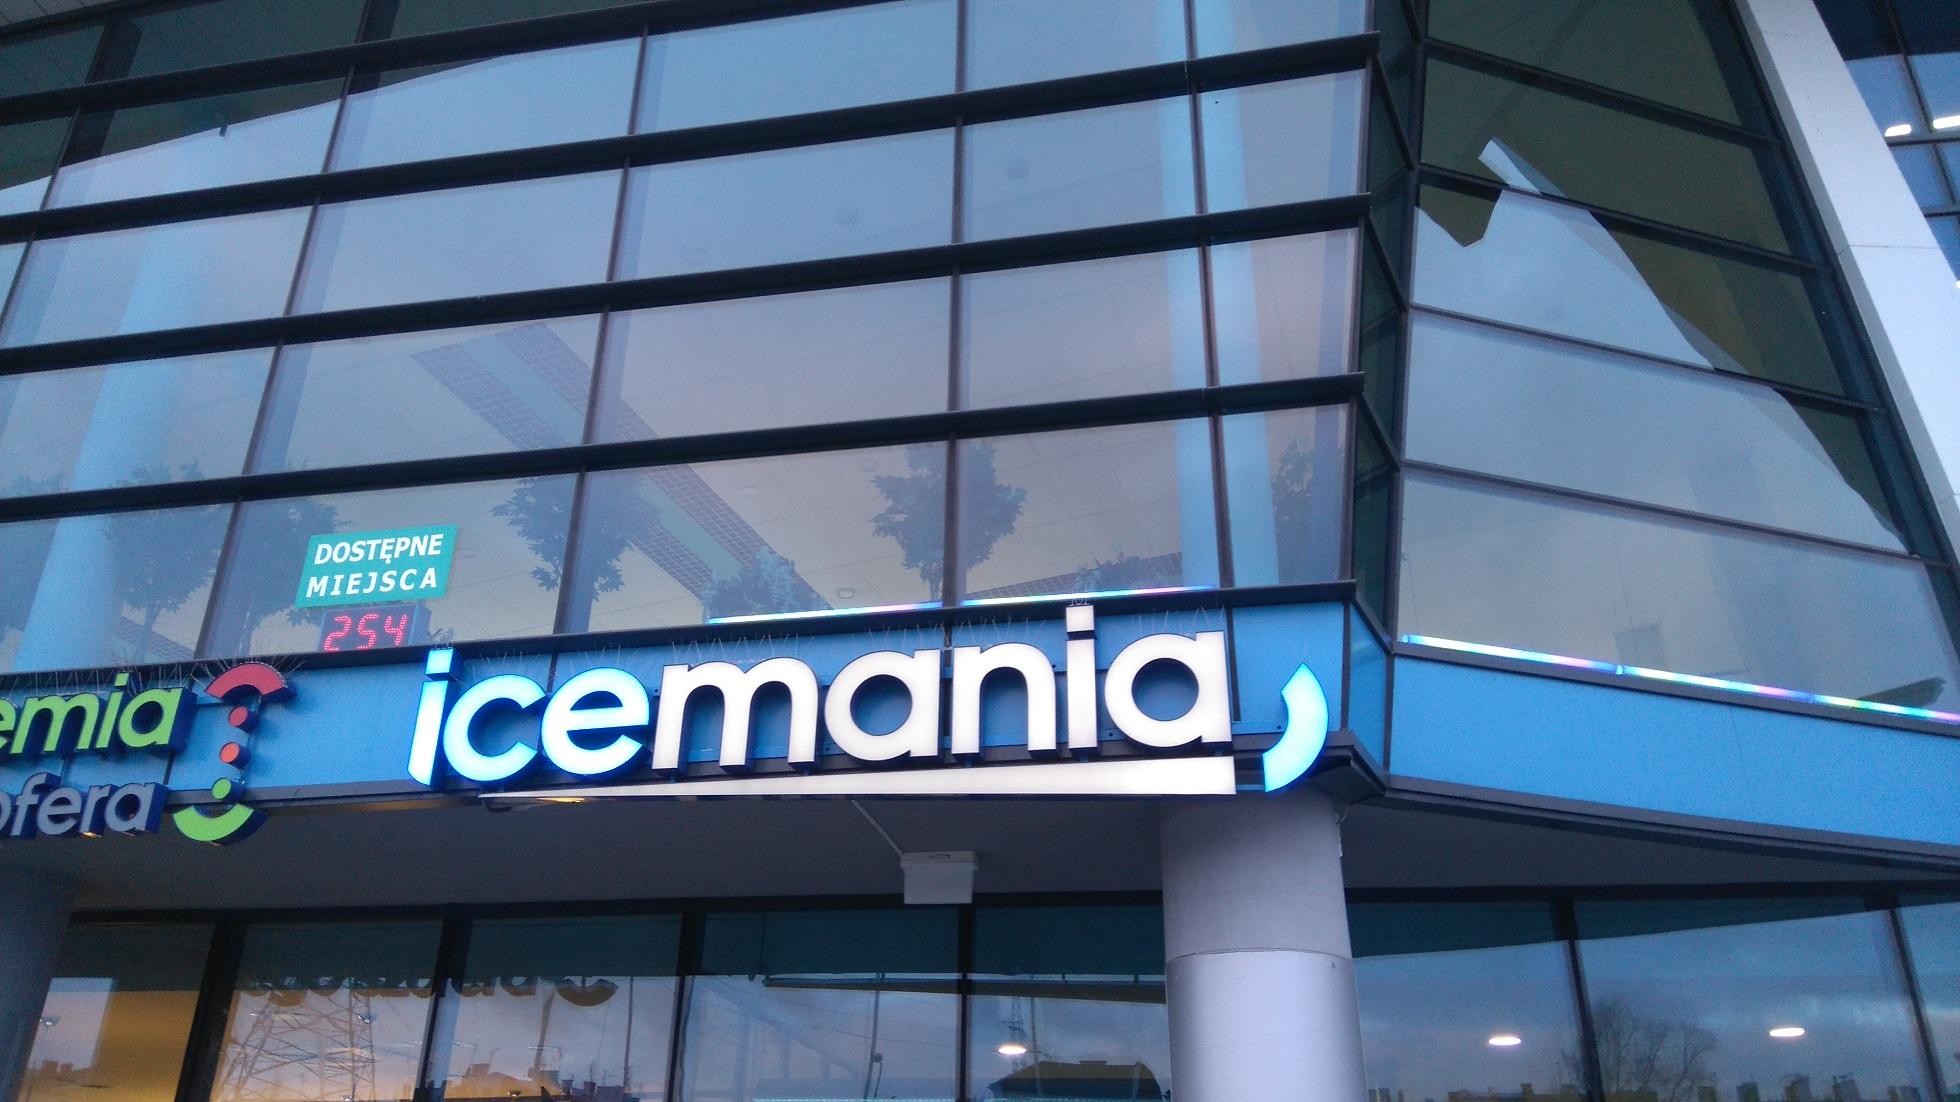 logo icemania na budynku